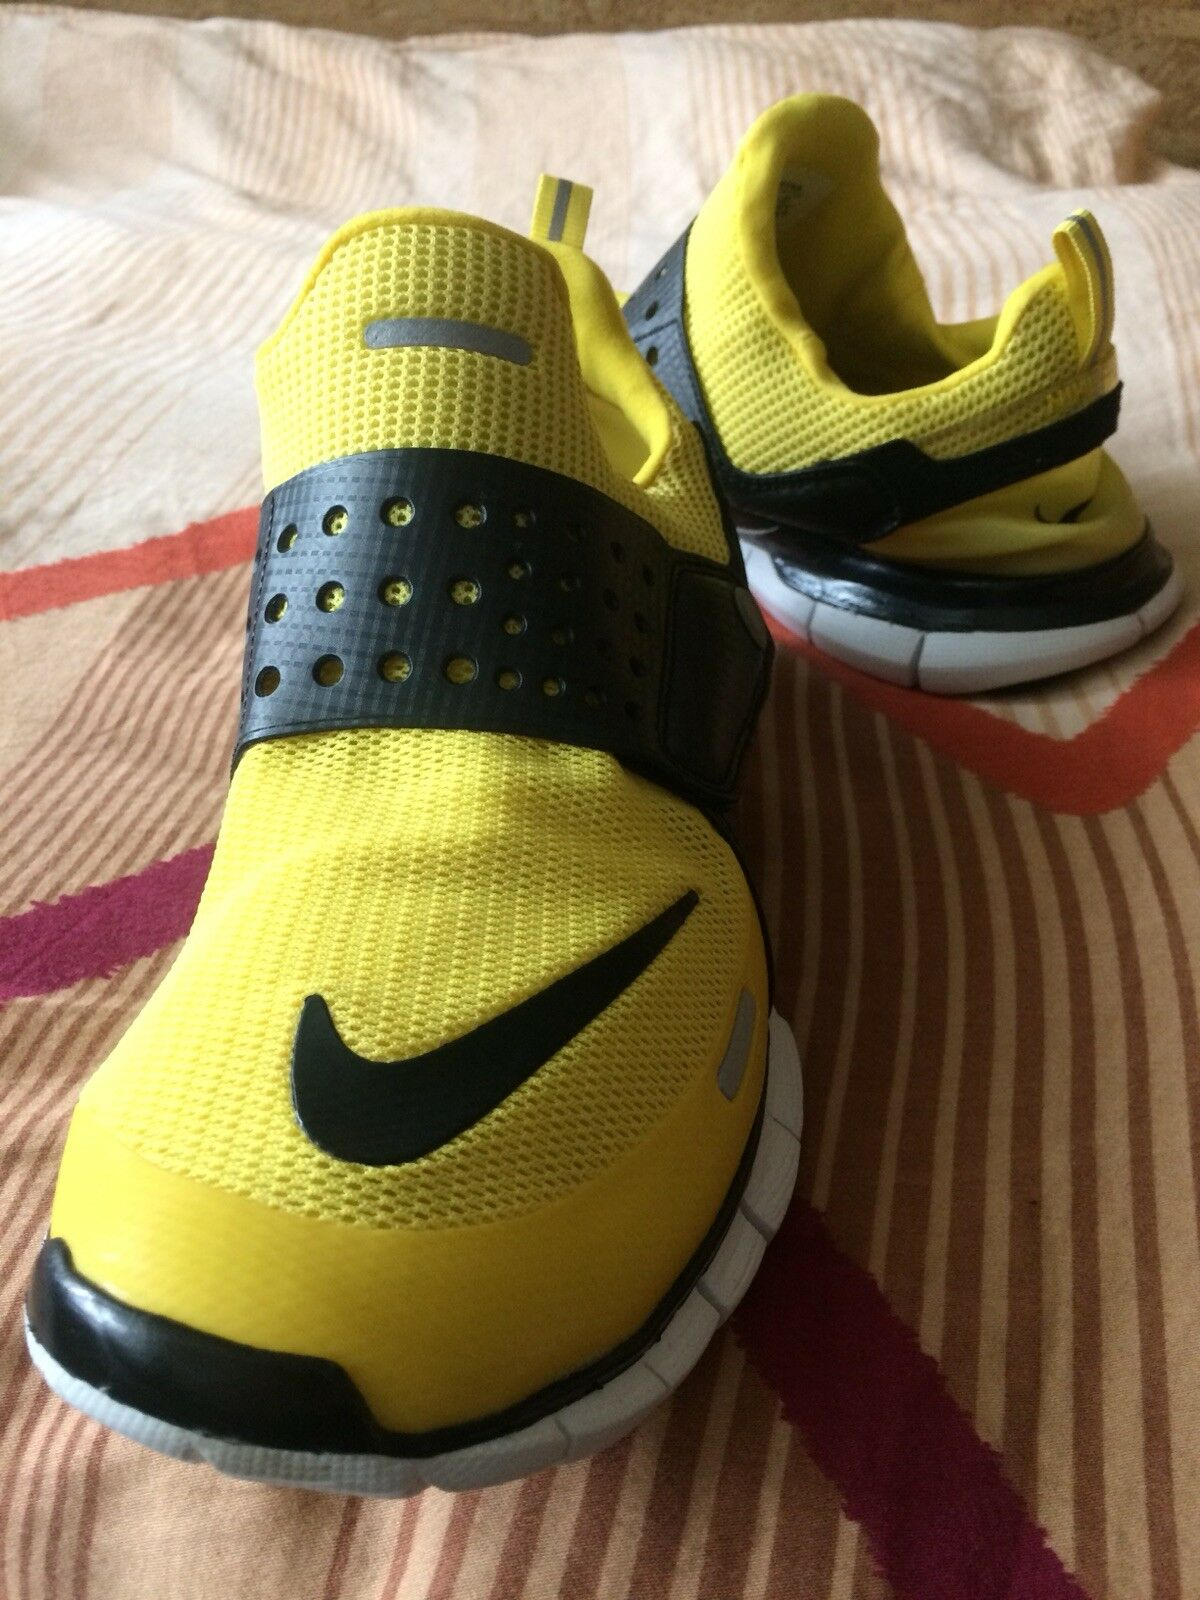 nike nike nike free 4.0 extrem selten RAR für Liebhaber sneakerheads, Gr. 43 NEU 5642c6